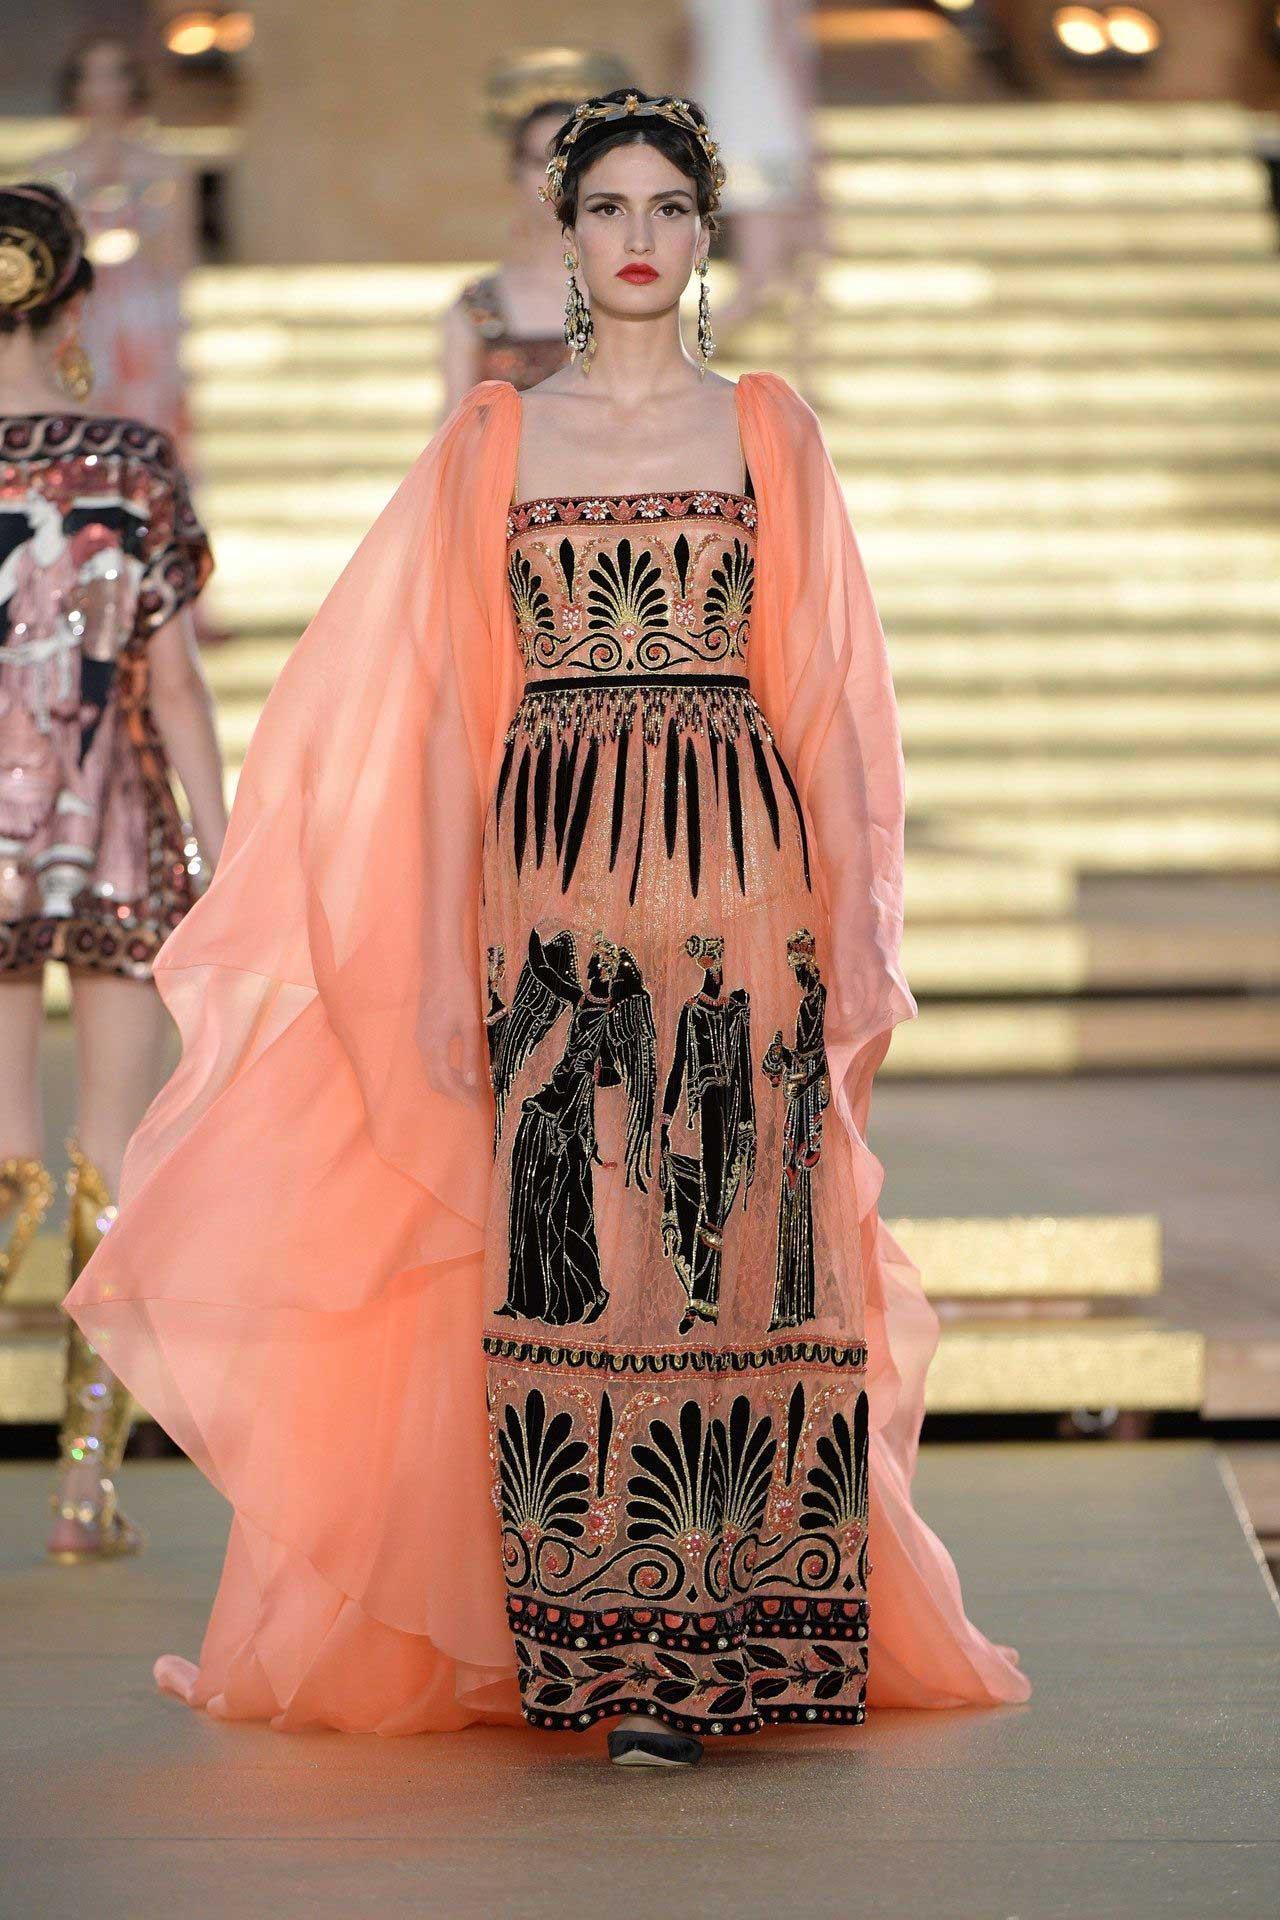 Photo: Courtesy of Dolce & Gabbana